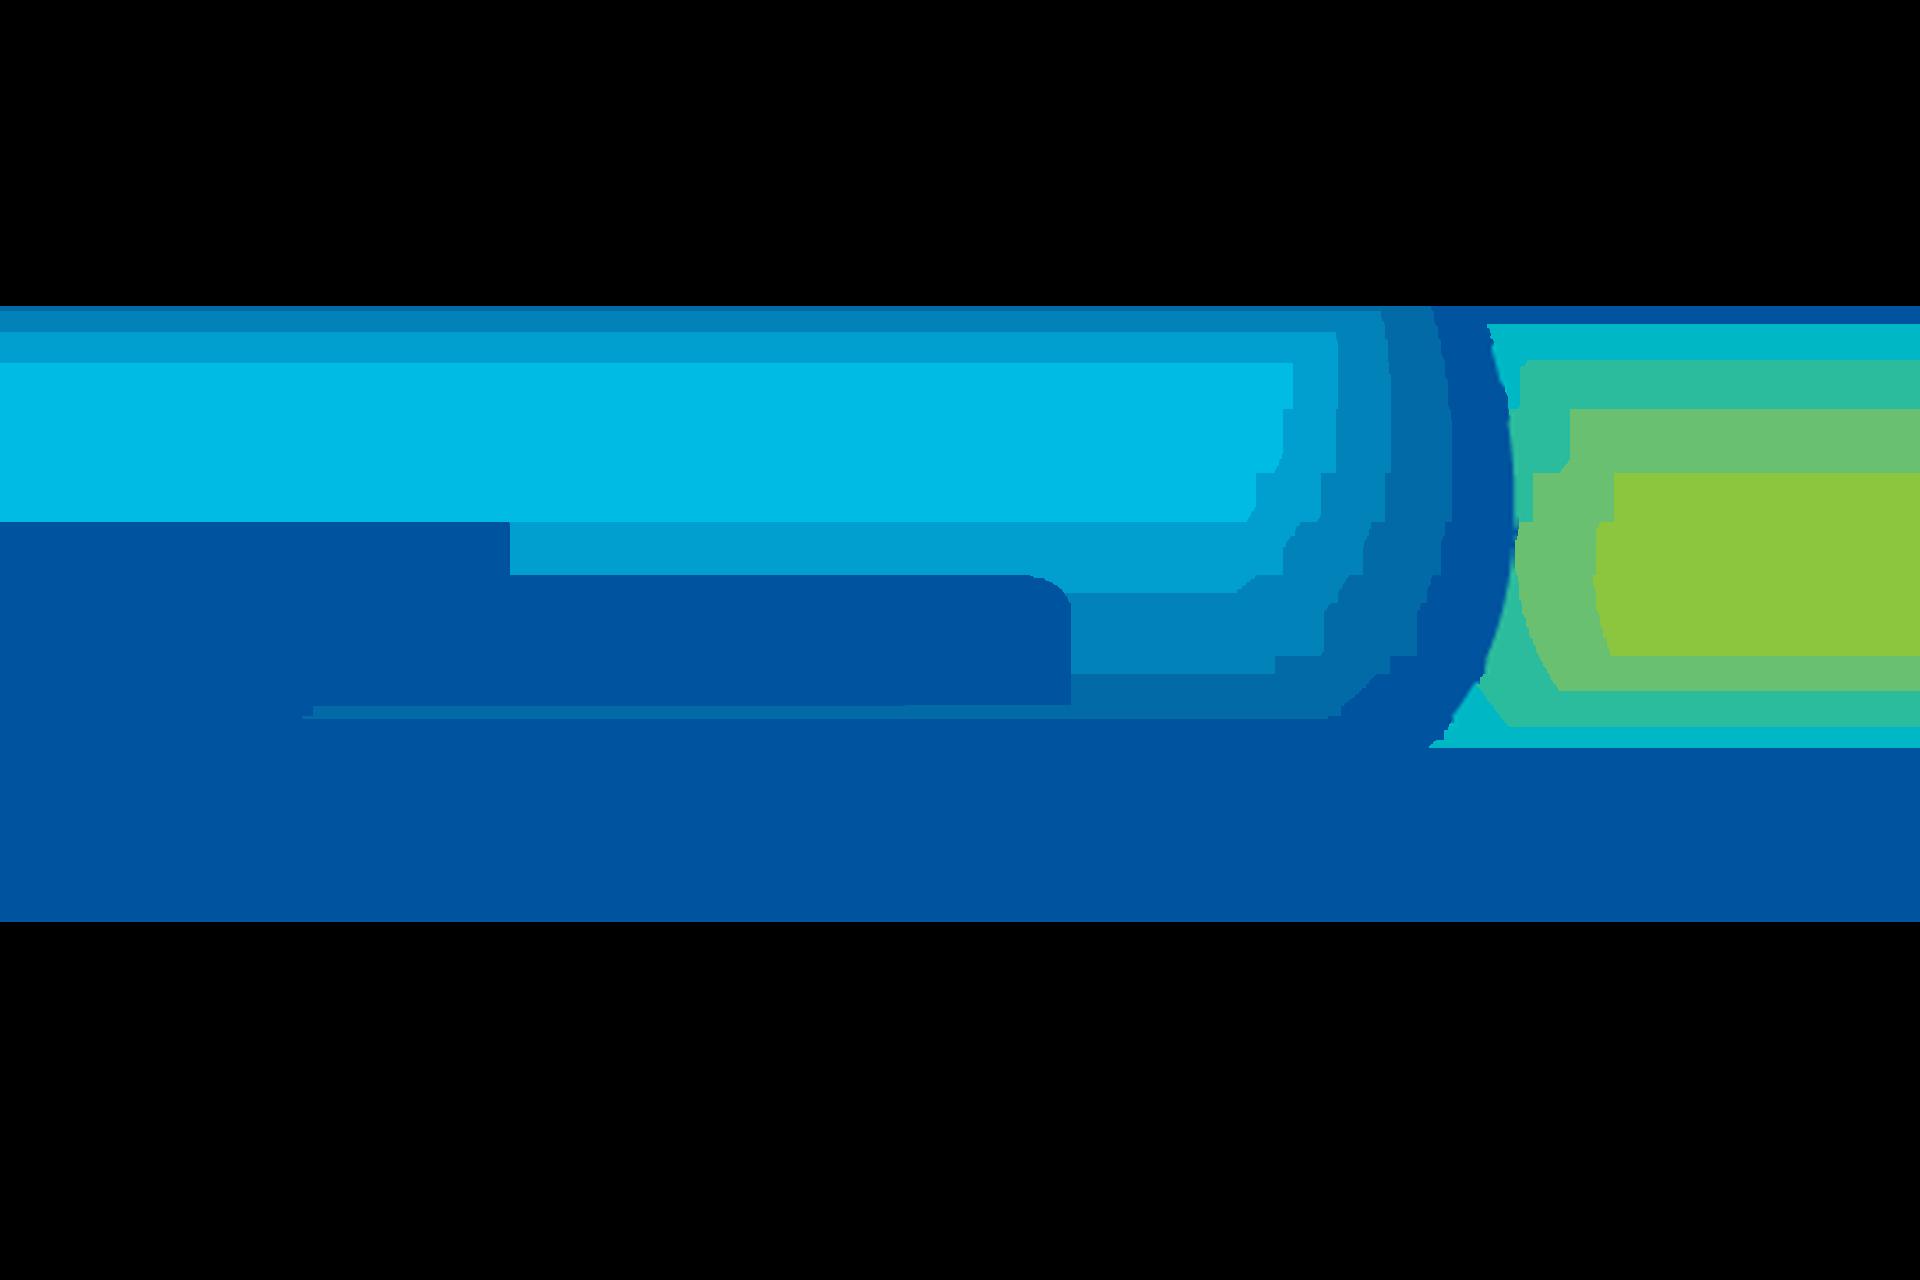 johnson controls referenz jentner metallveredelung logo farbig